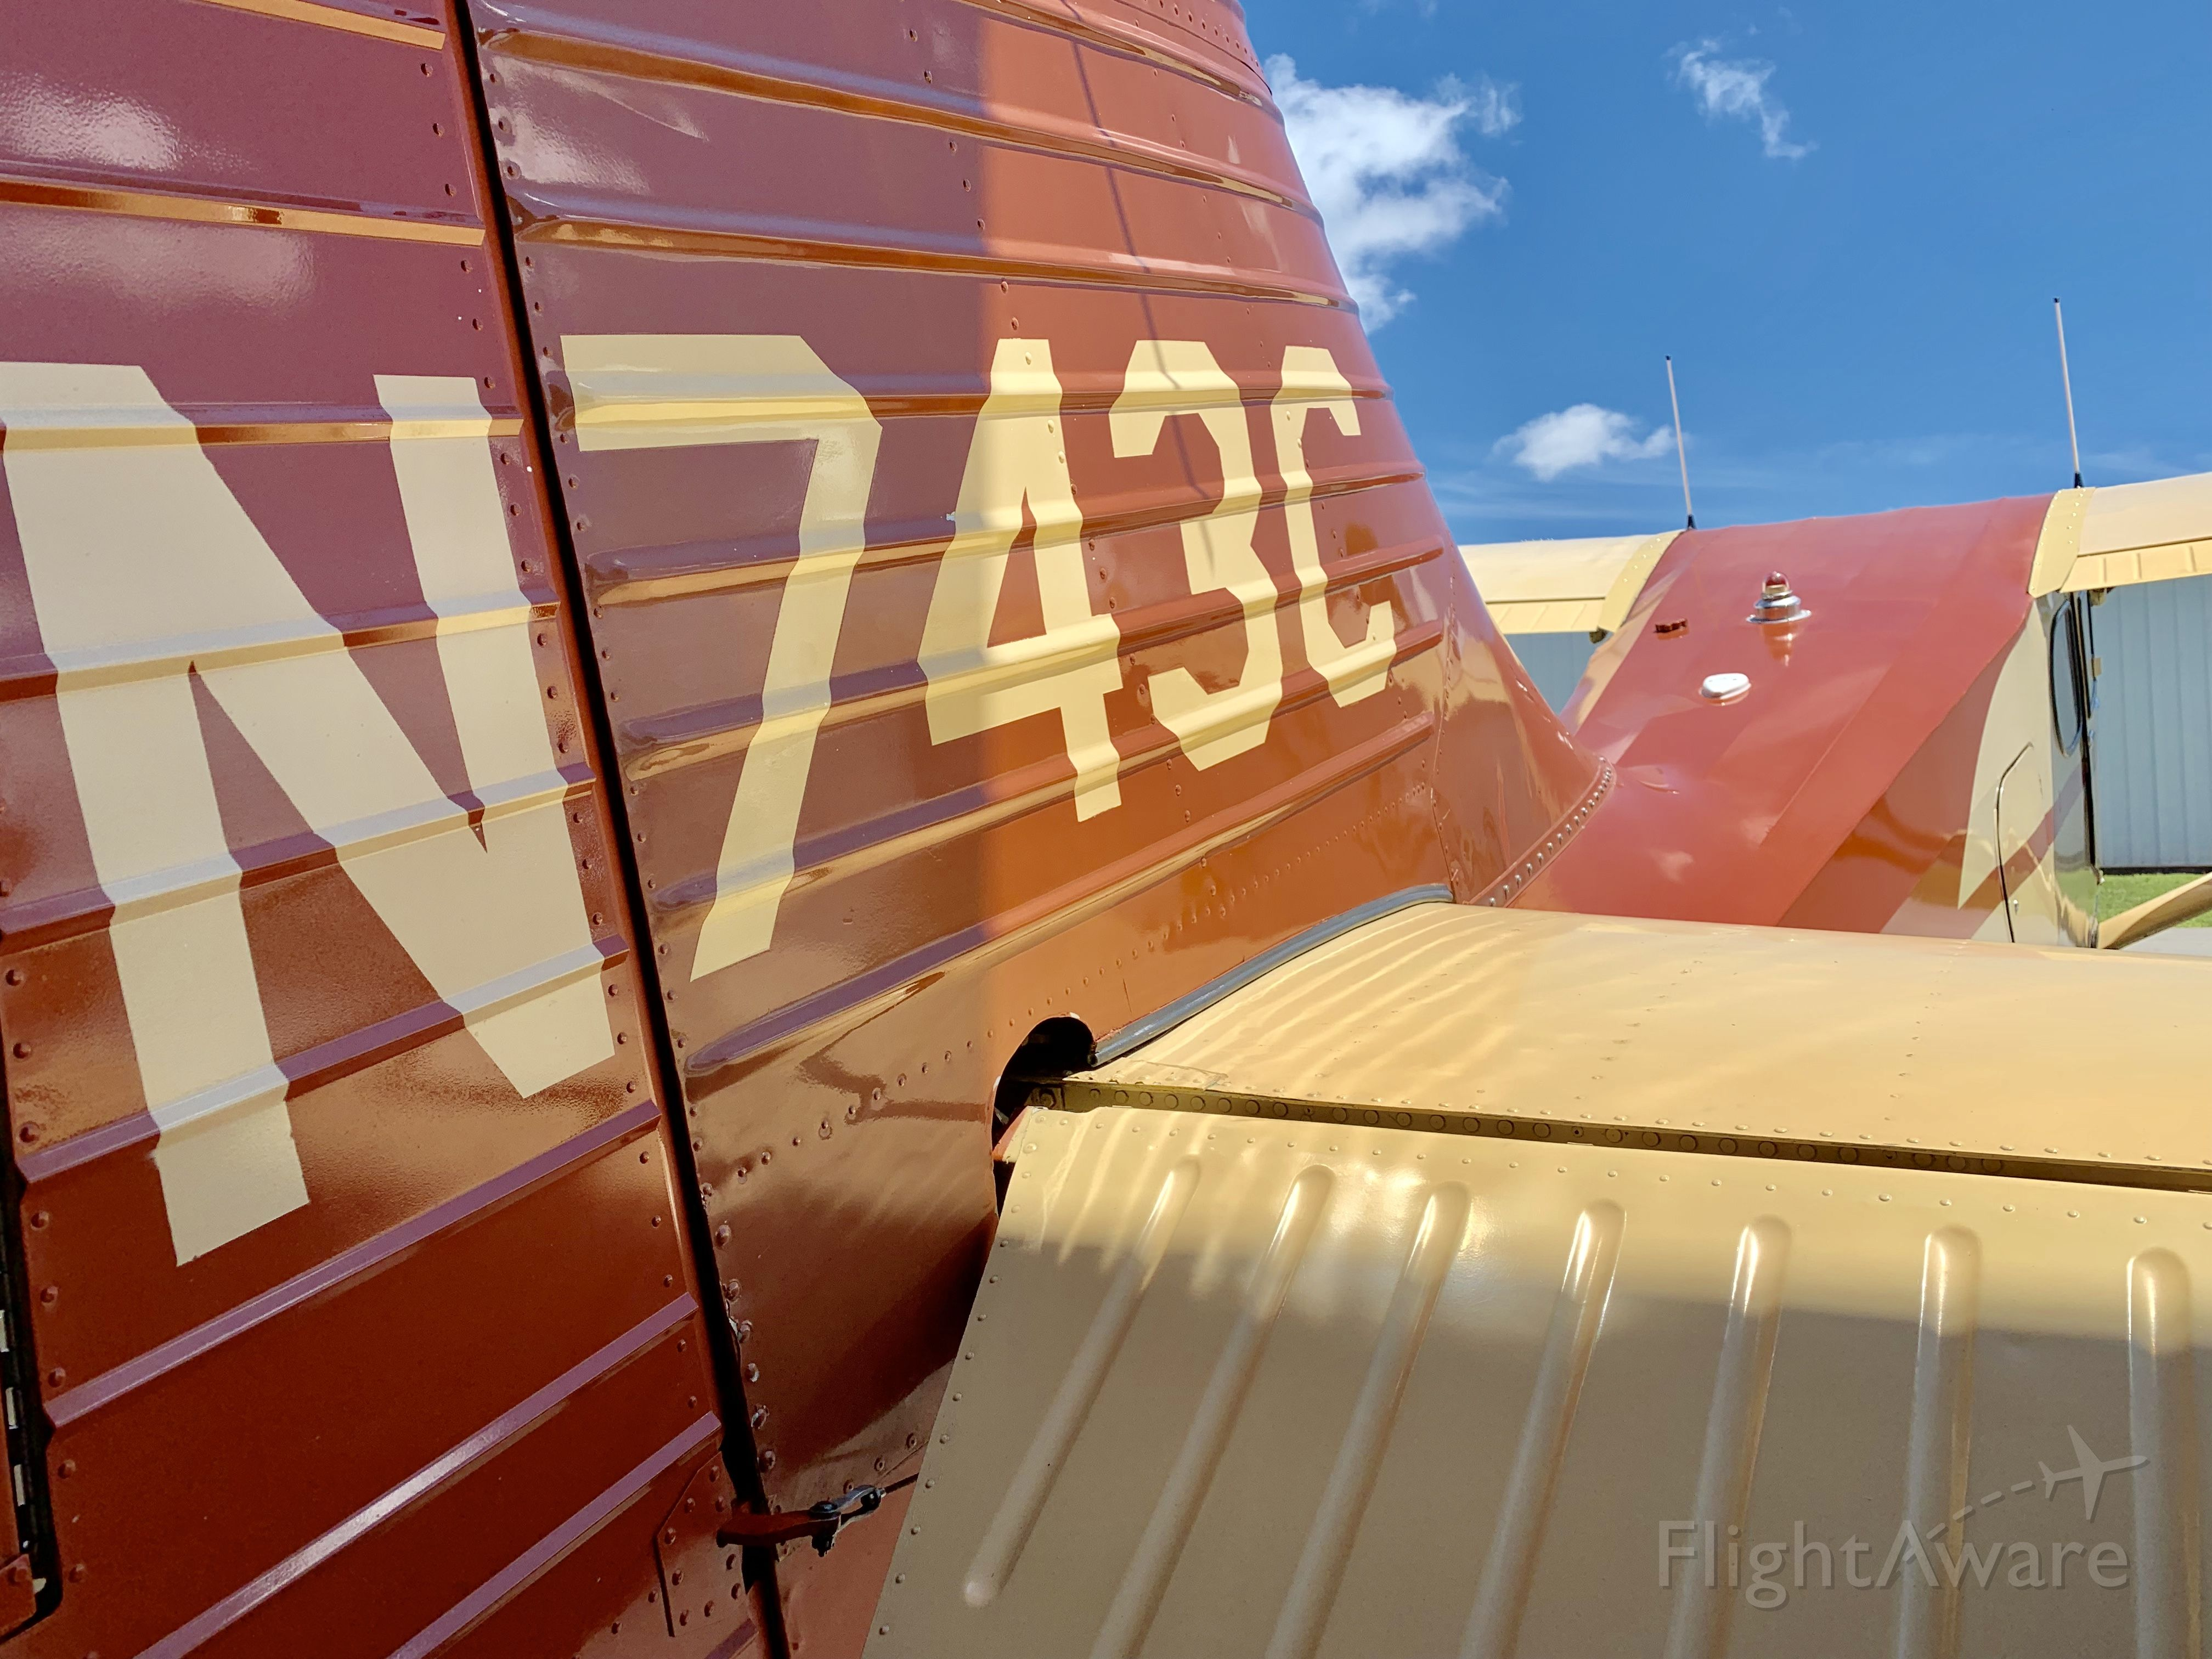 Piper 108 Voyager (N743C) - Vintage paint scheme on this 1947 Stinson